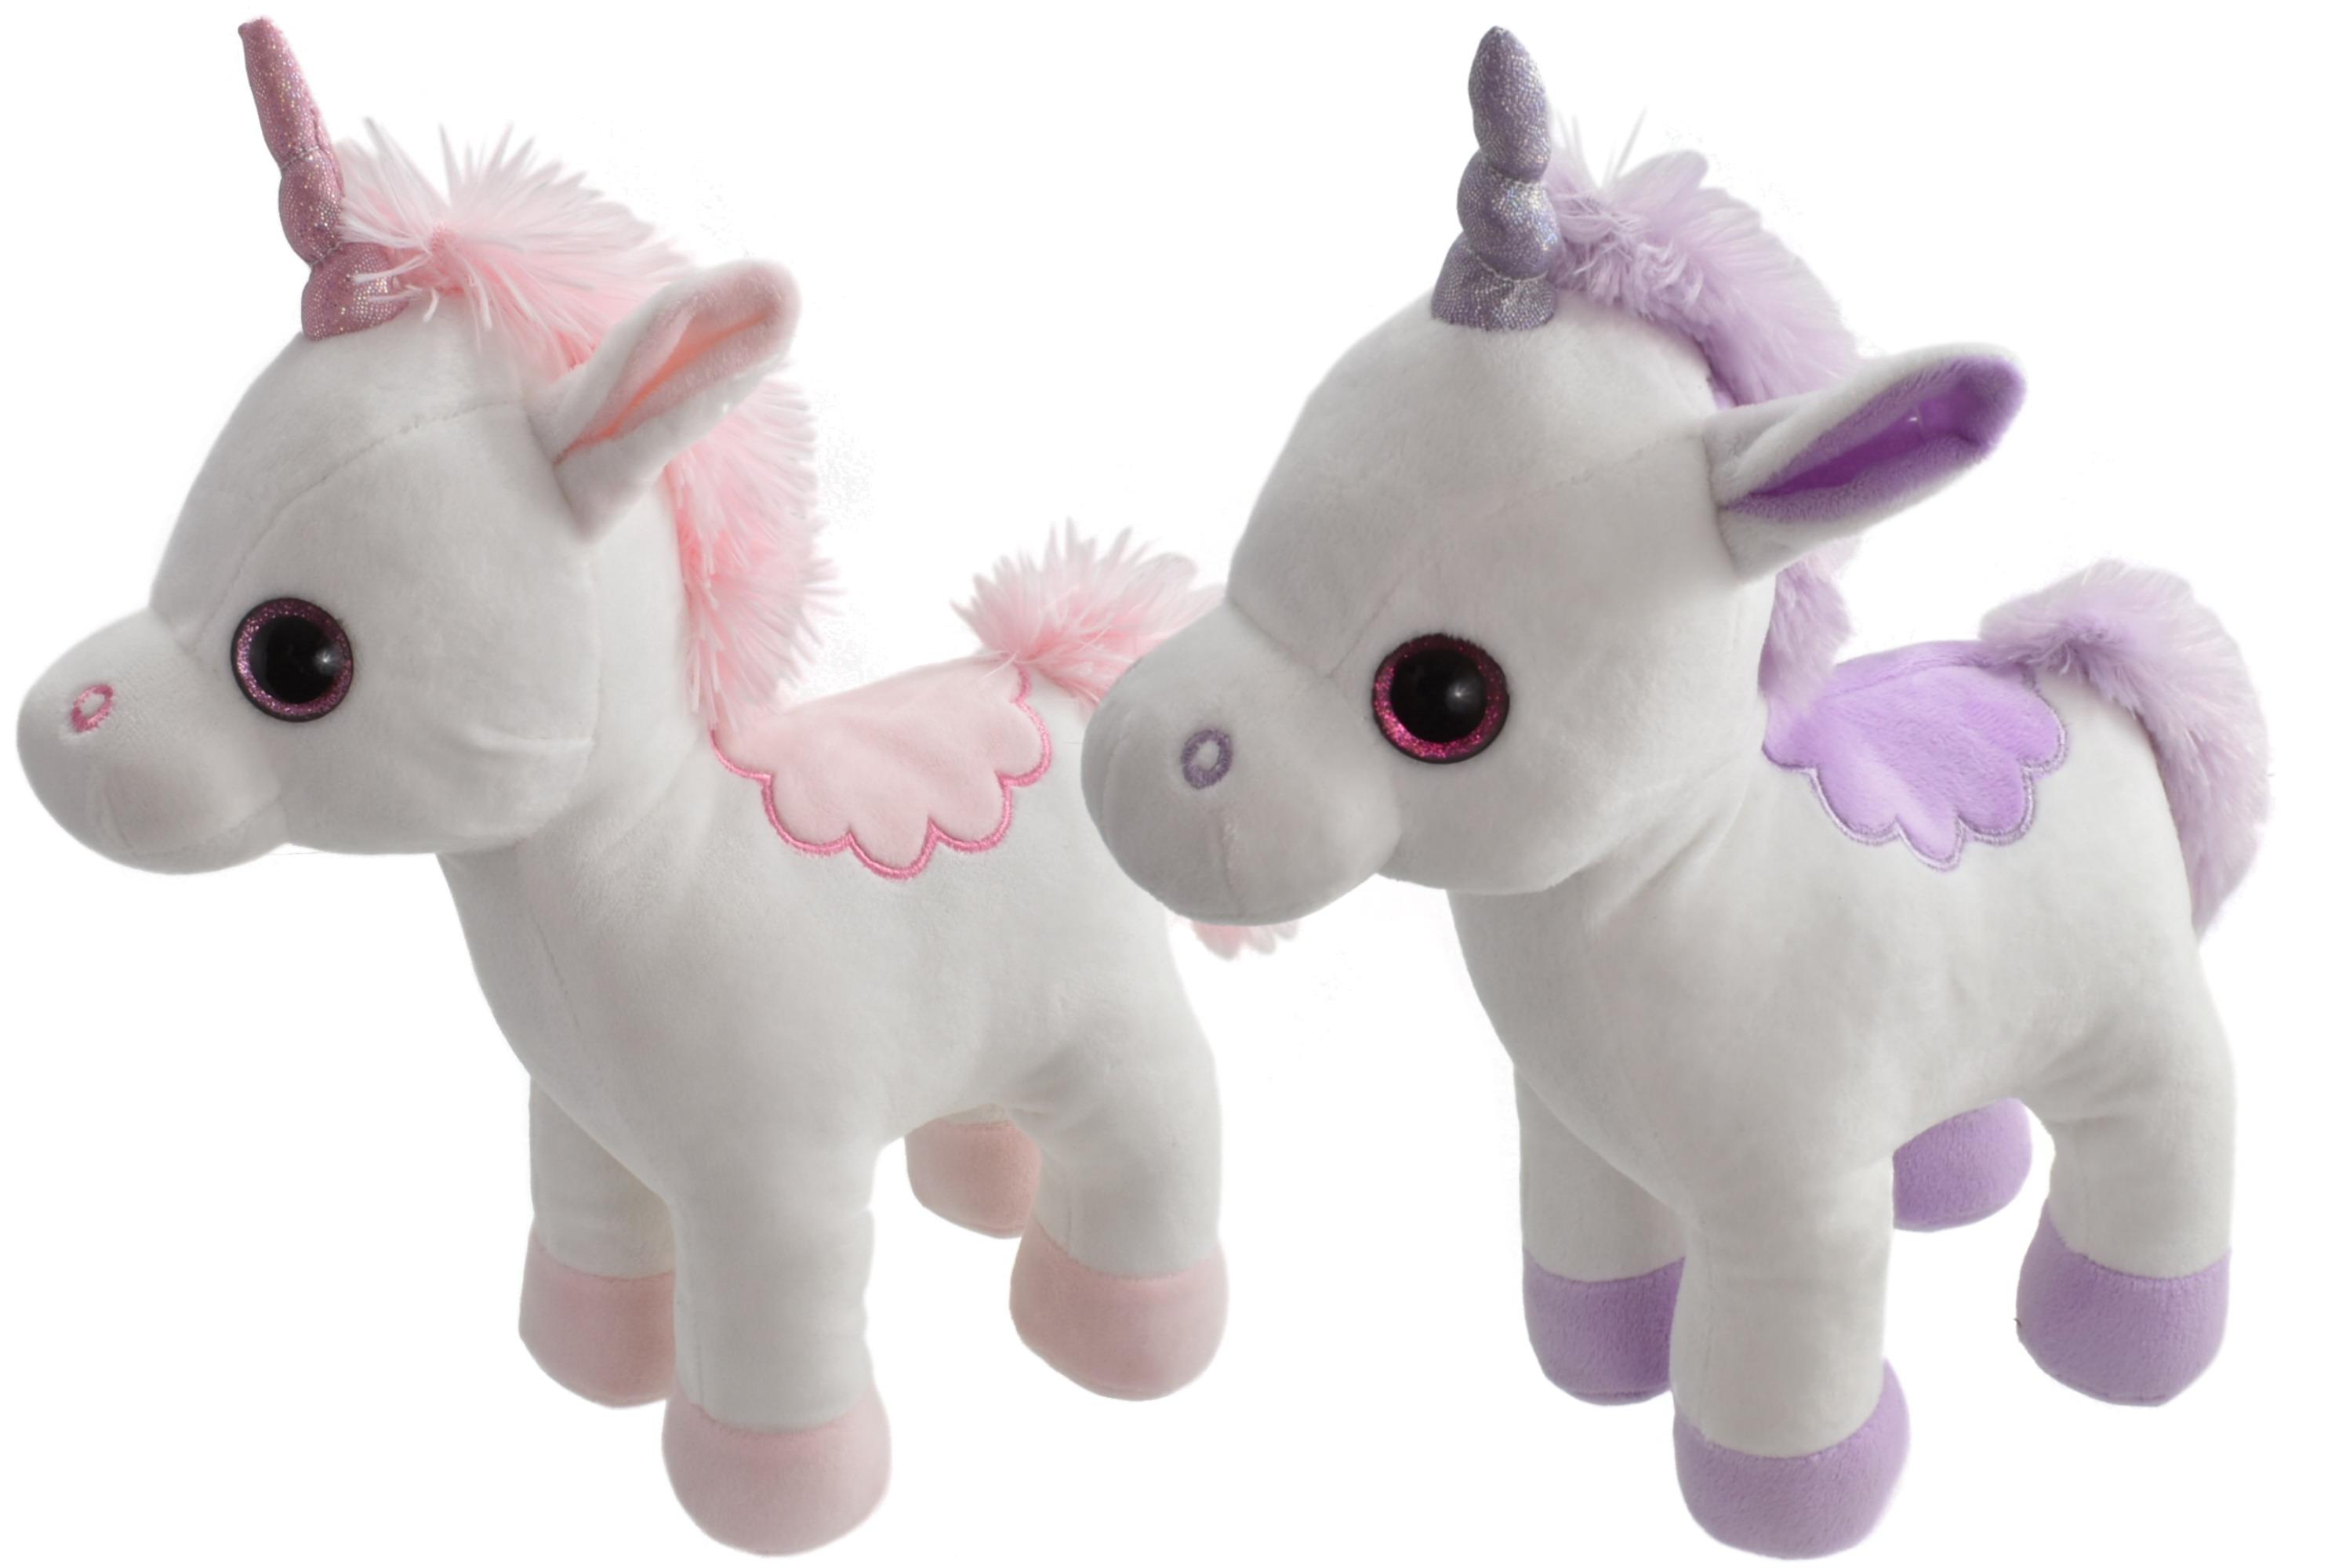 27cm Plush Standing Unicorns With Large Sparkly Eyes